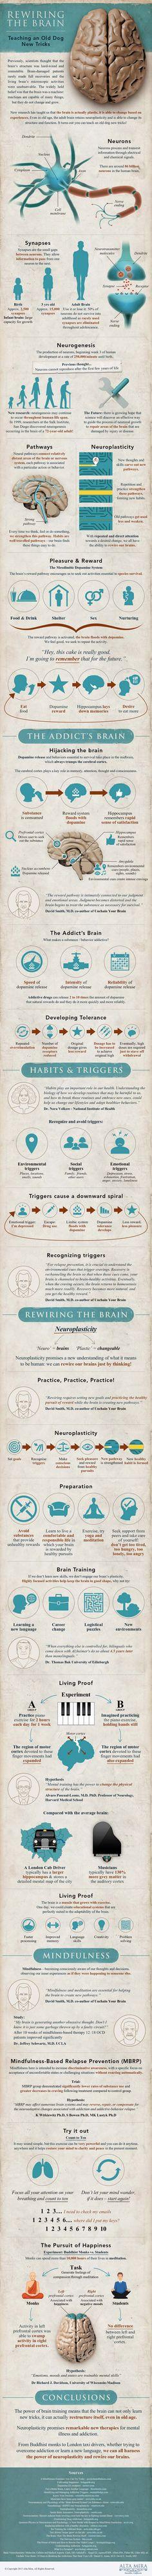 Rewiring The Brain #Infographic #Health